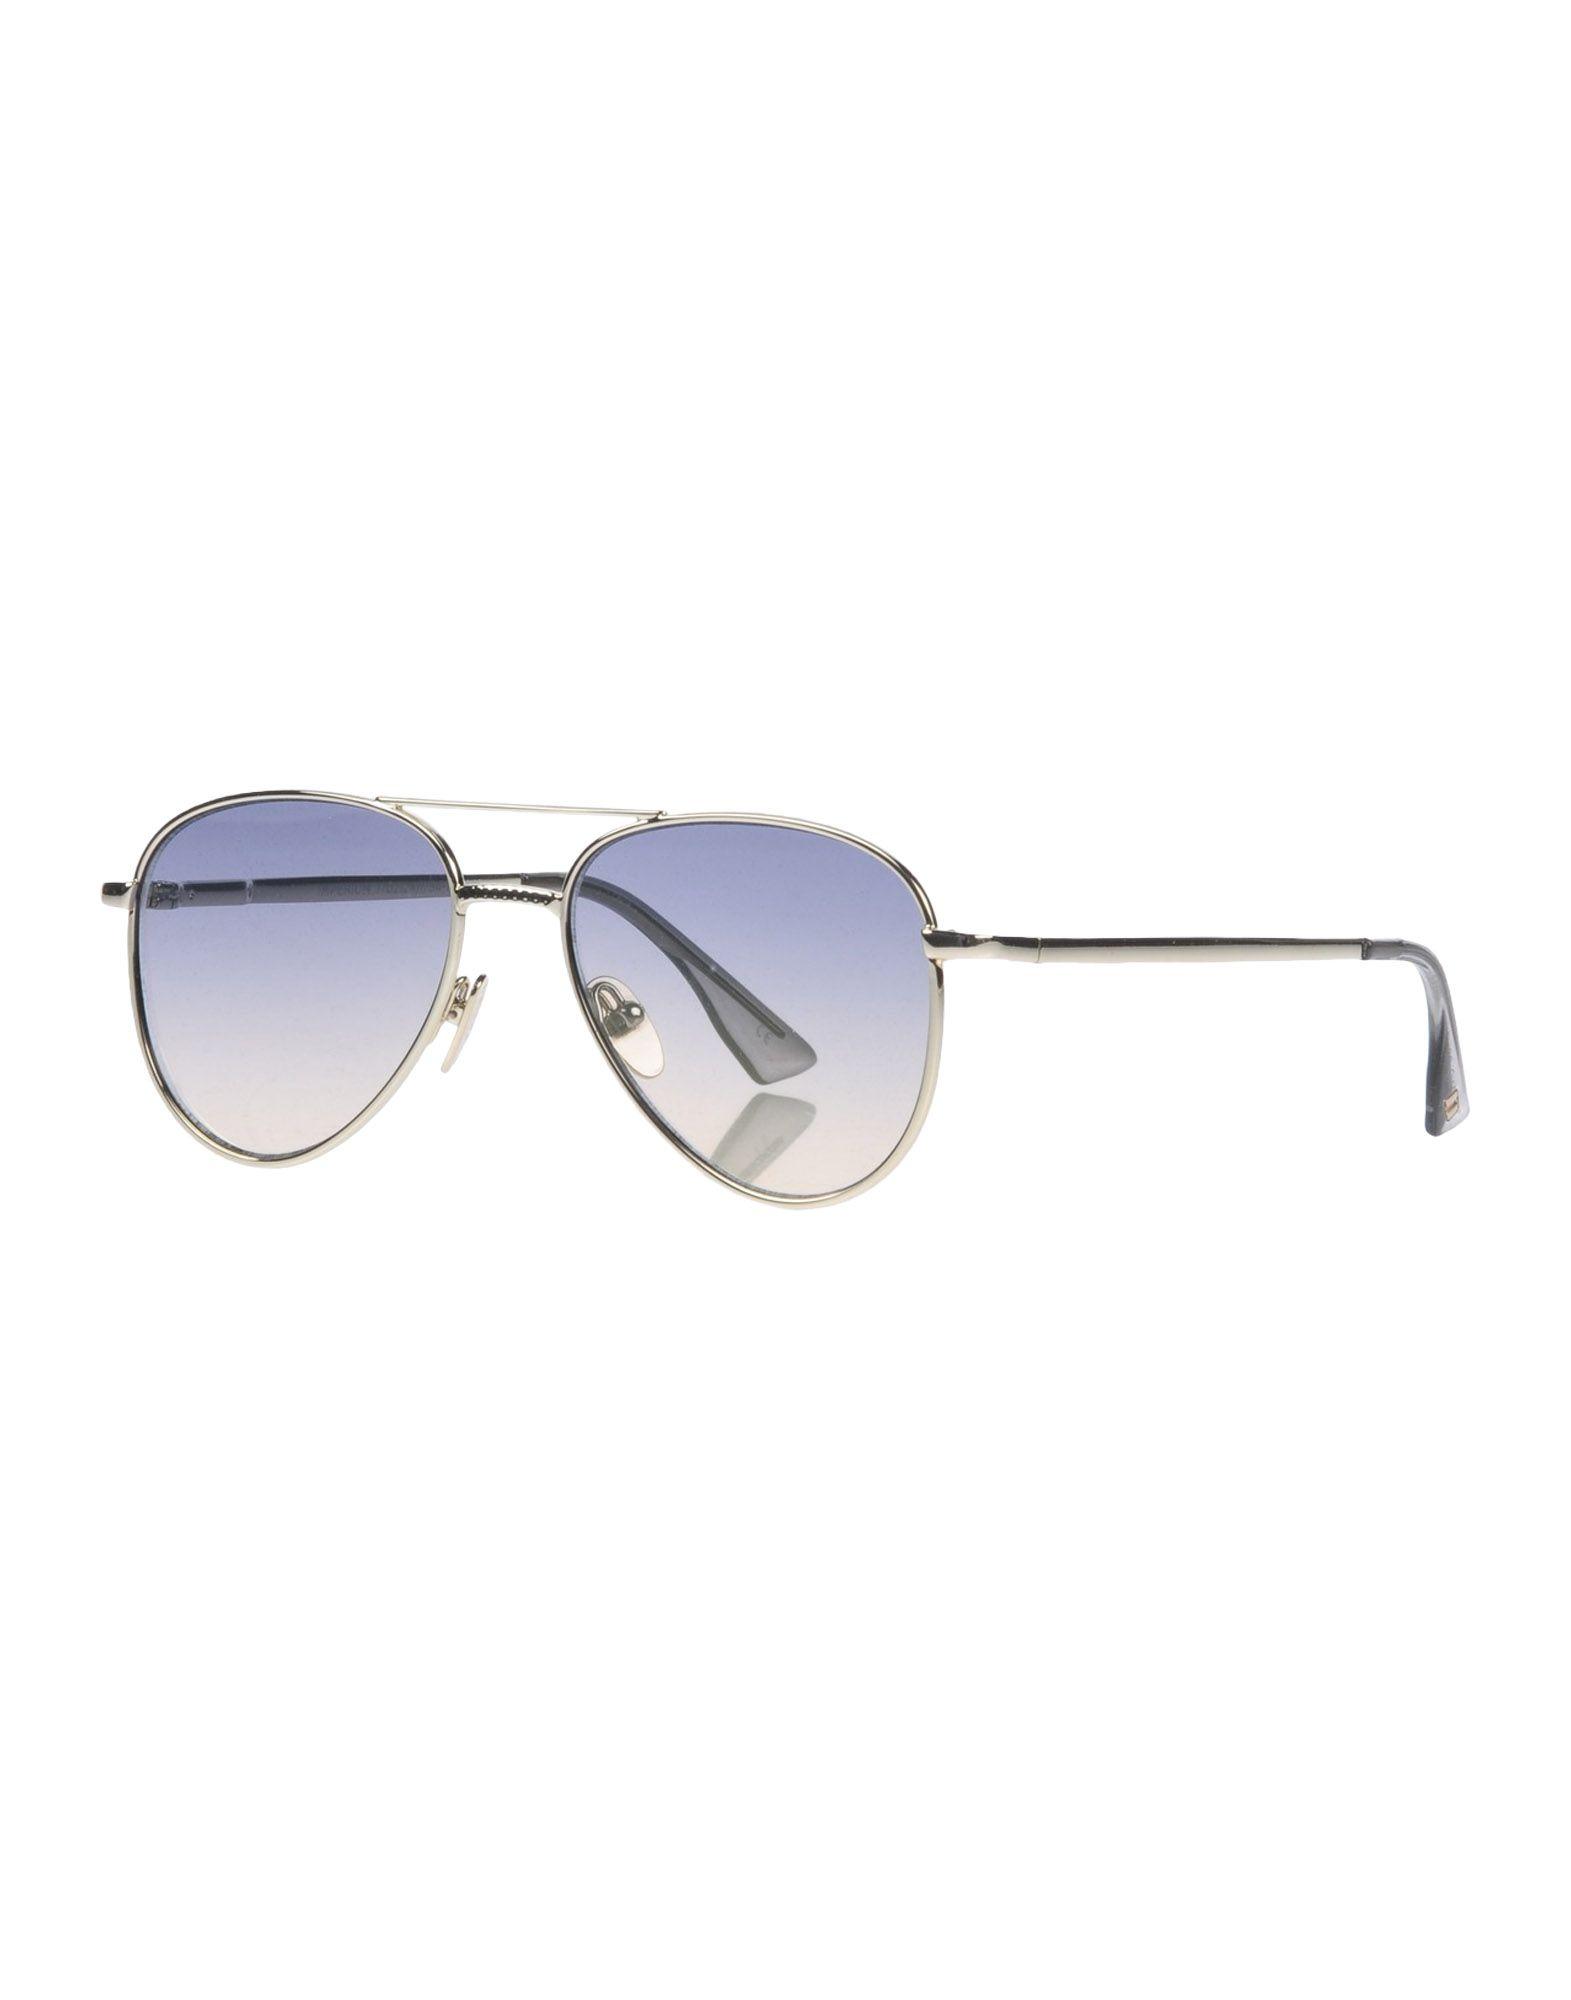 LE SPECS Солнечные очки jjc ru dk25 кремнезема видоискатель очки очки применимое nikon d5600 d5500 d5300 d5200 d5100 d5000 d3400 d3300 d3200 d3100